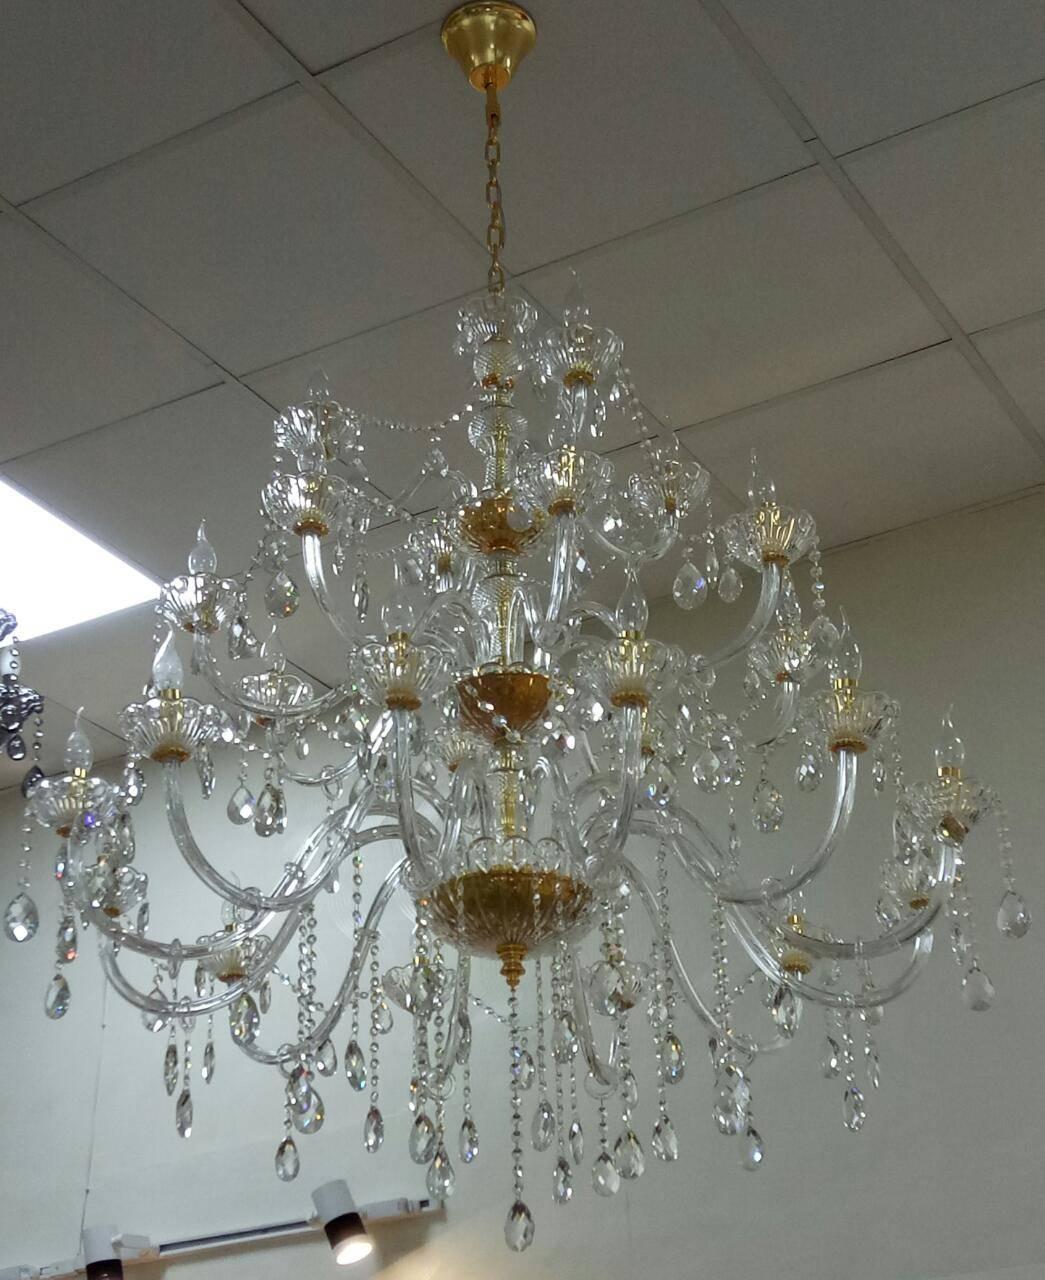 18 Lamps Chandelier (CH-010)